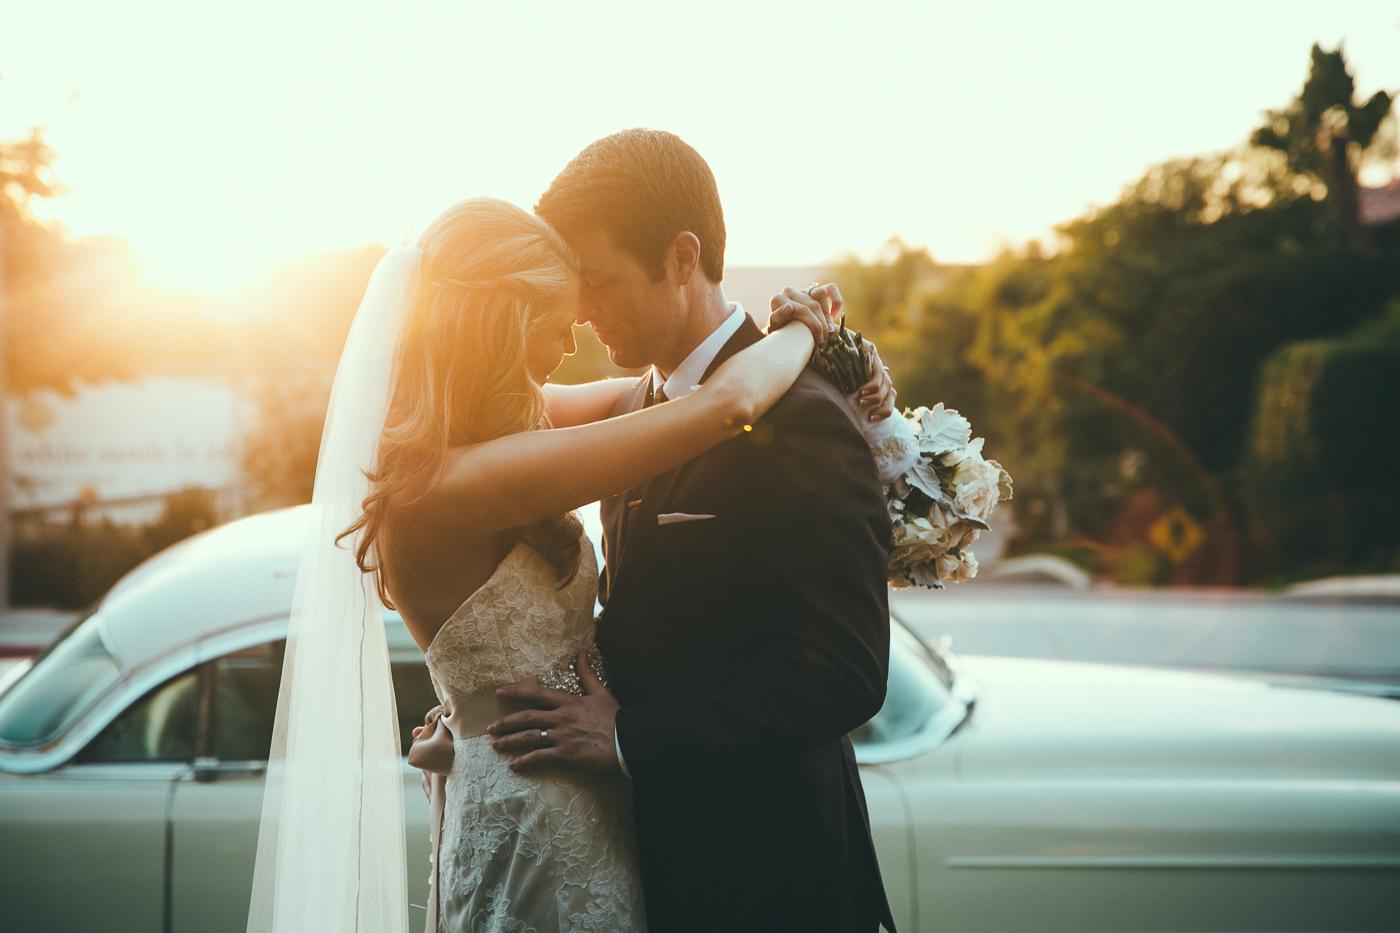 RYAN_&_KELLEY_DARLINGTON_HOUSE_WEDDING_2014_7X9A2492.JPG